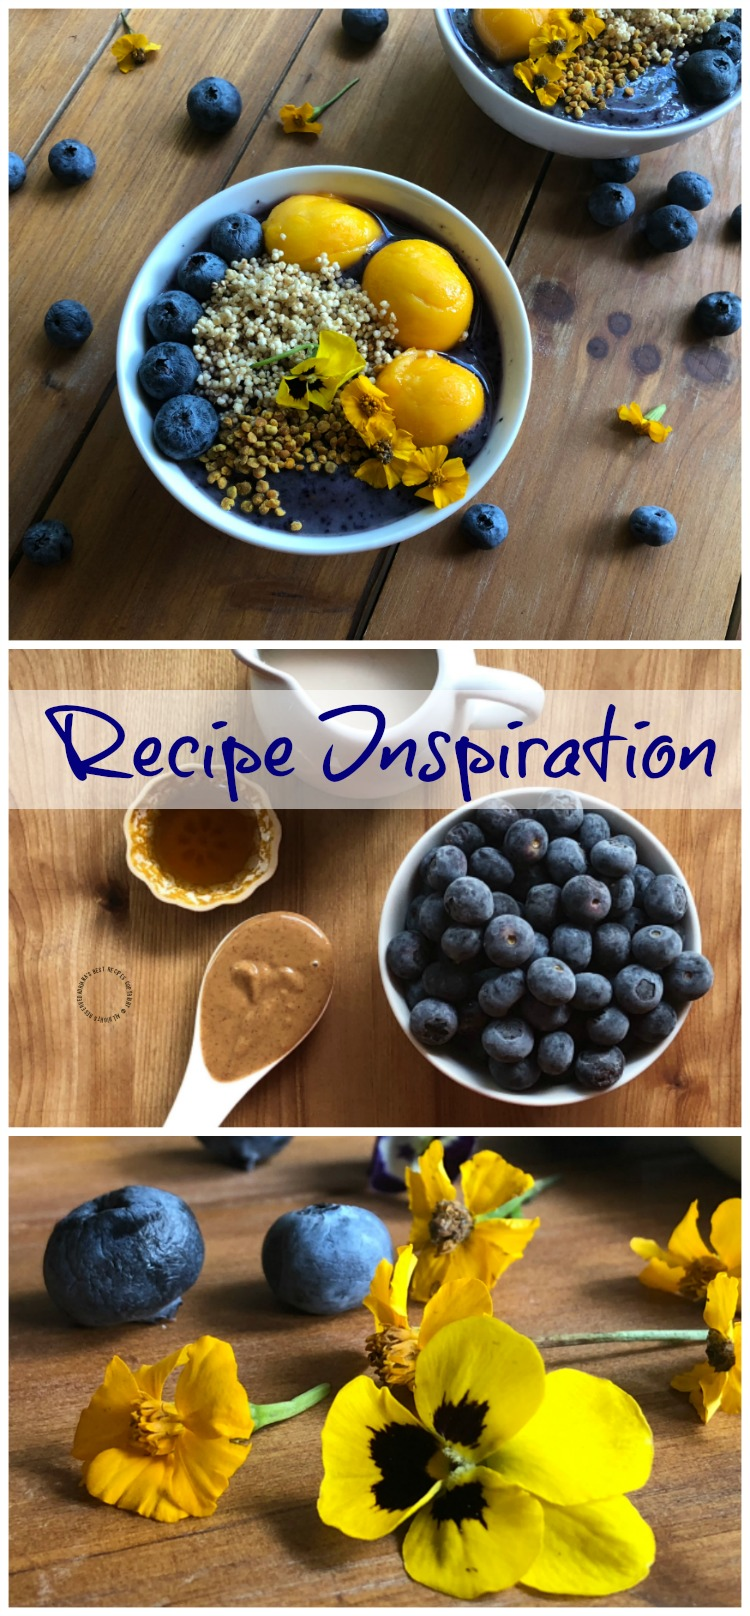 Recipe inspiration results with Alexa Skill Blueprints